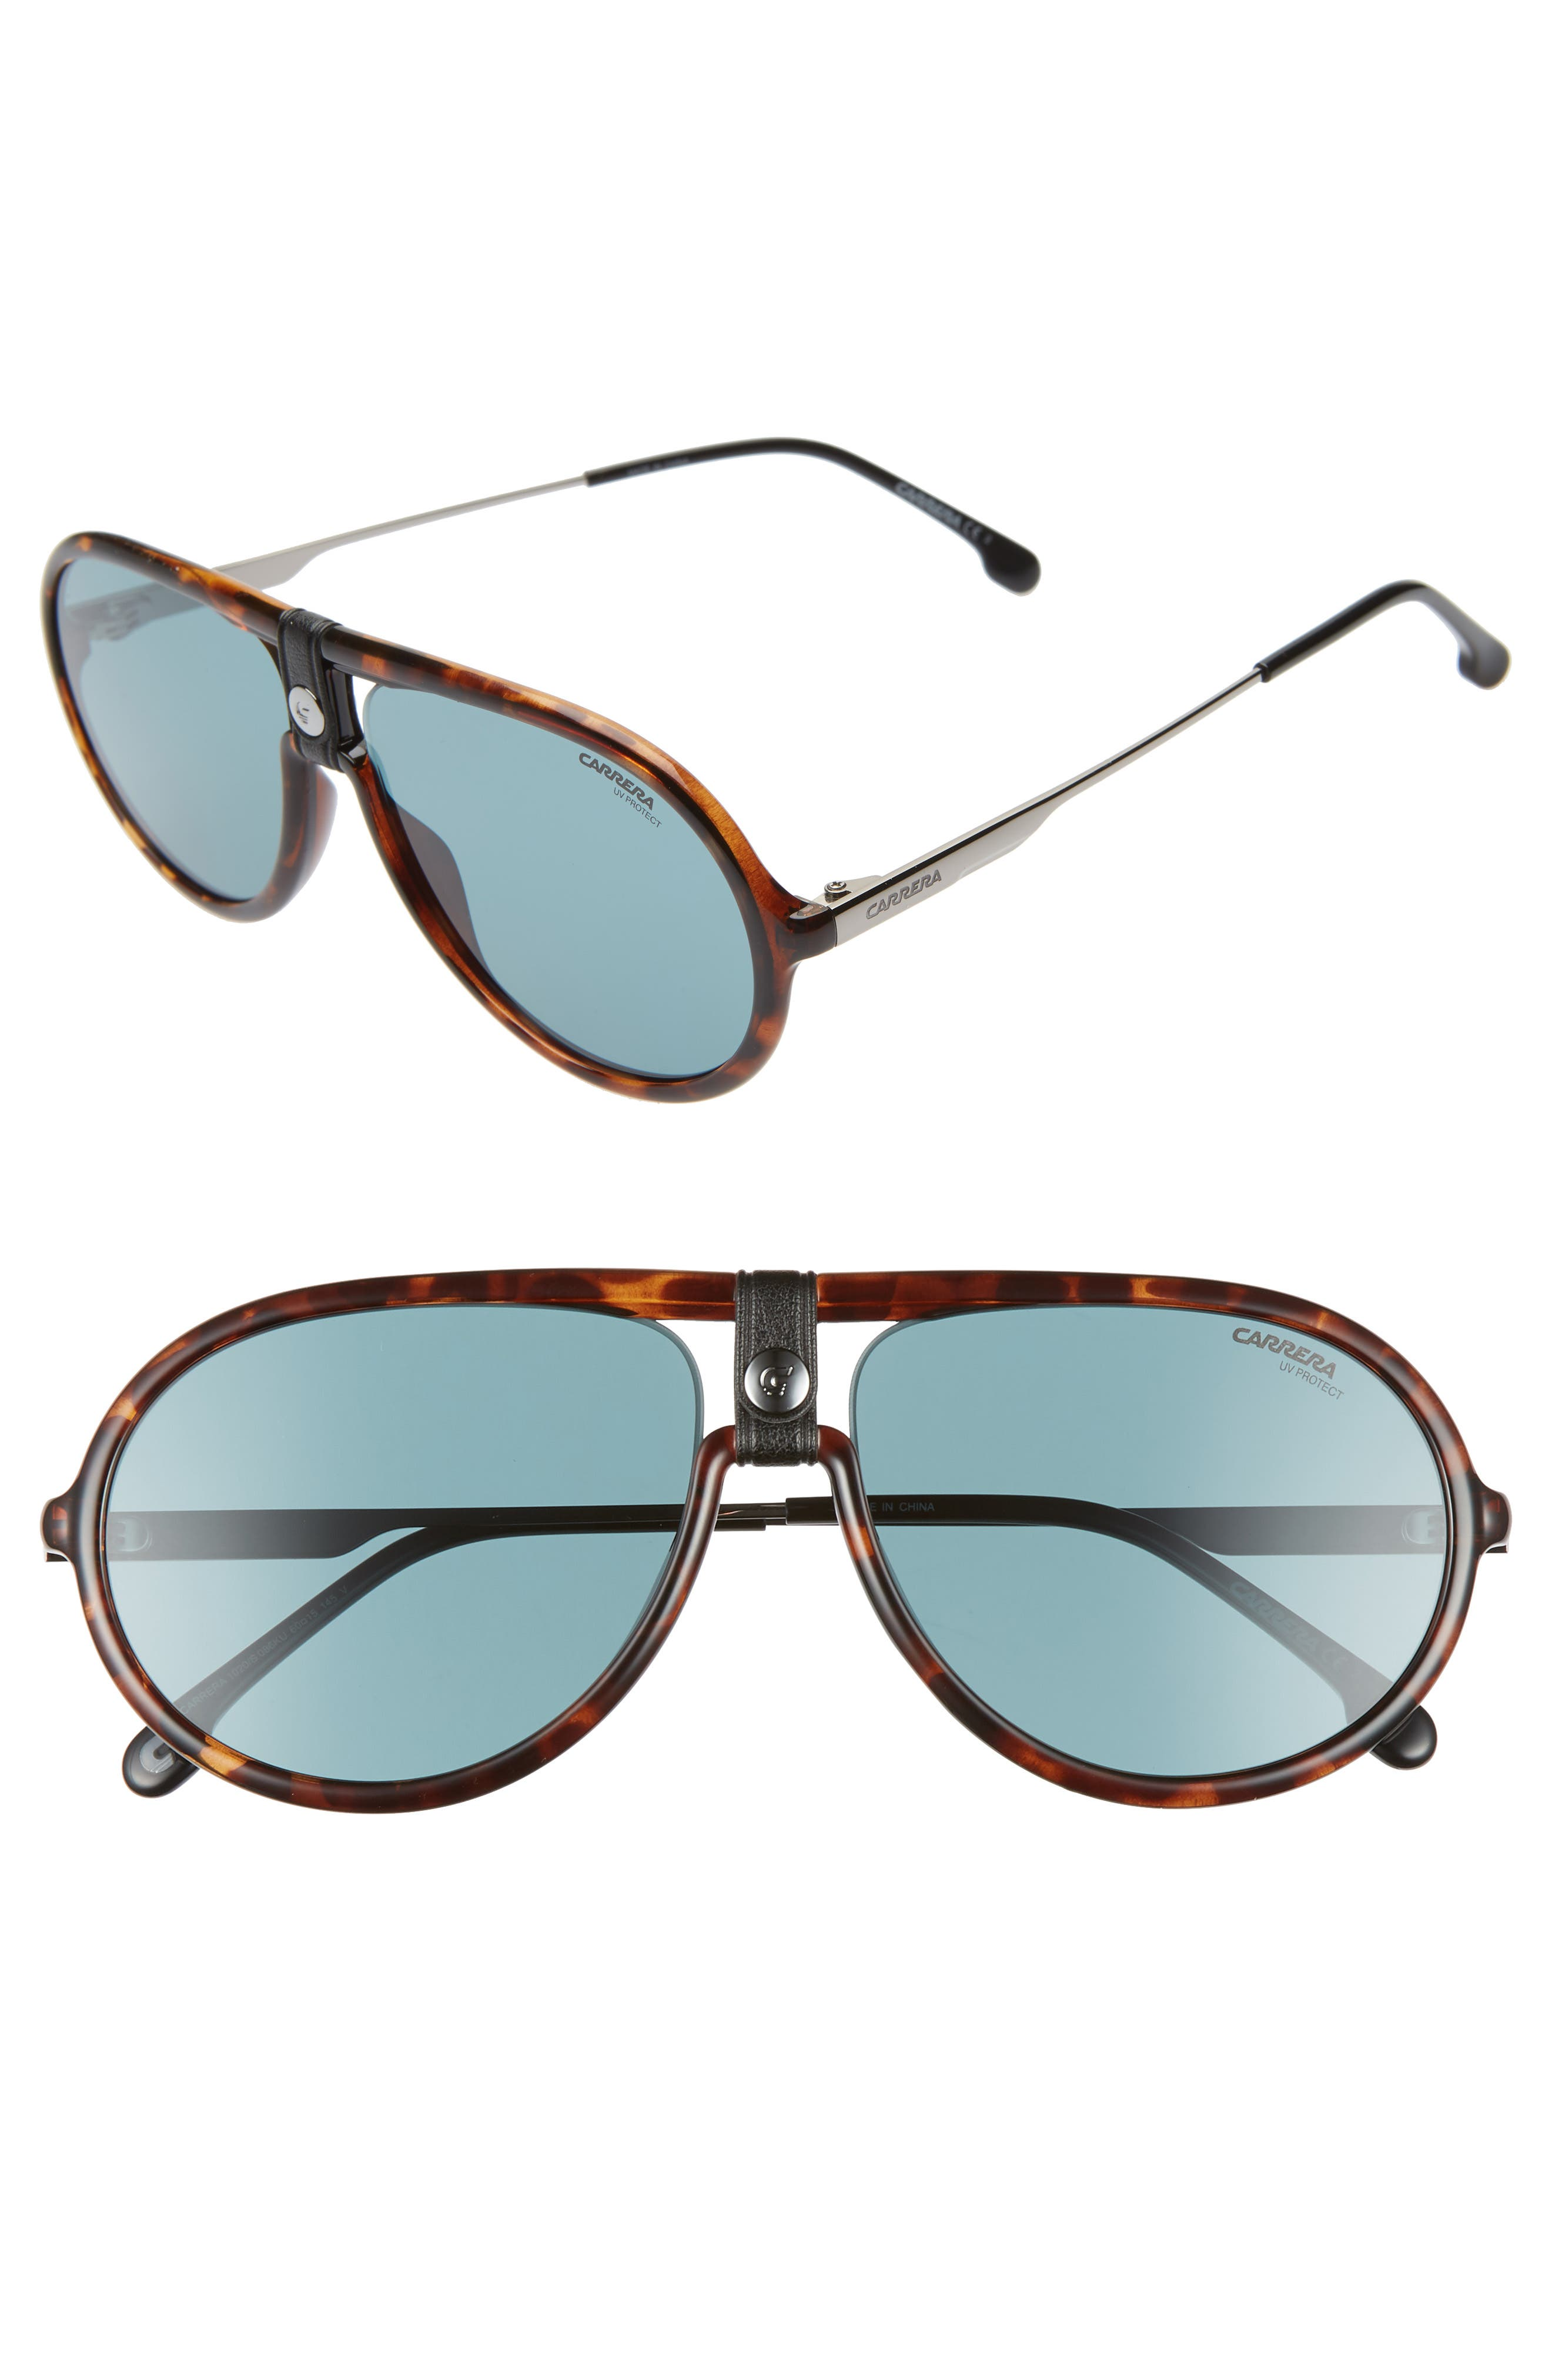 Carrera Eyewear 60Mm Polarized Aviator Sunglasses - Dark Havana